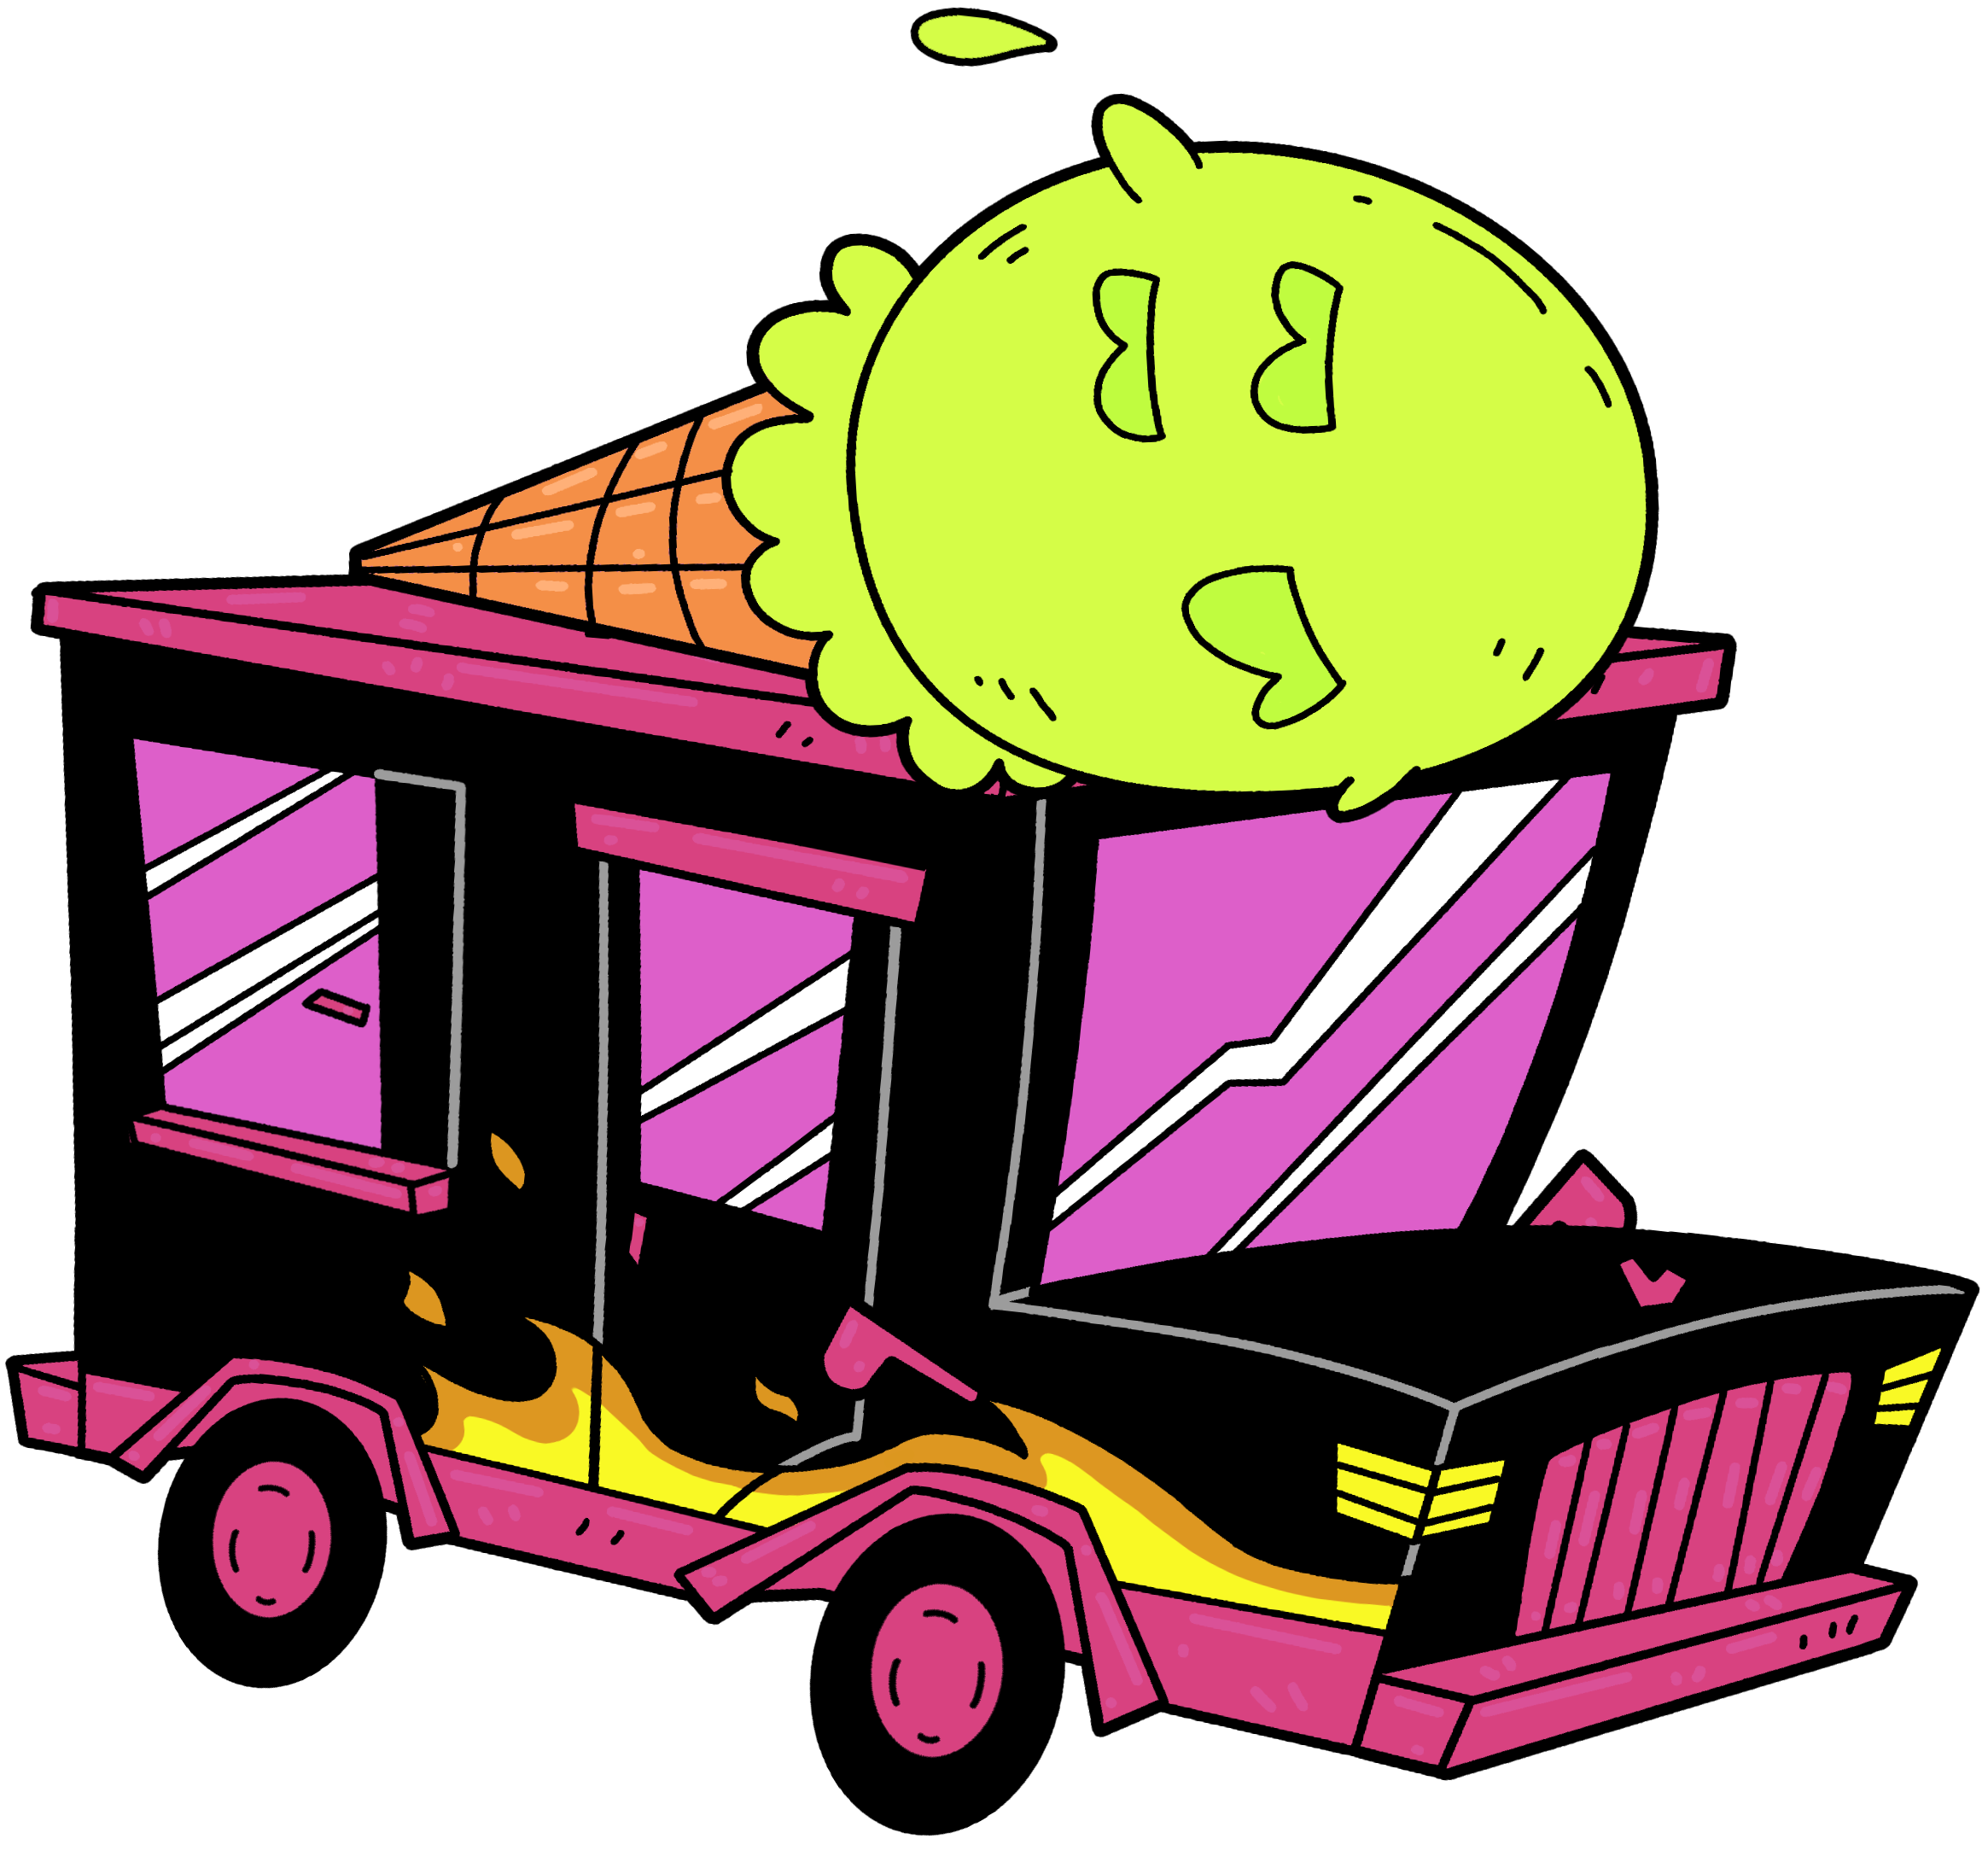 Toejam earl back in. Clipart car ice cream